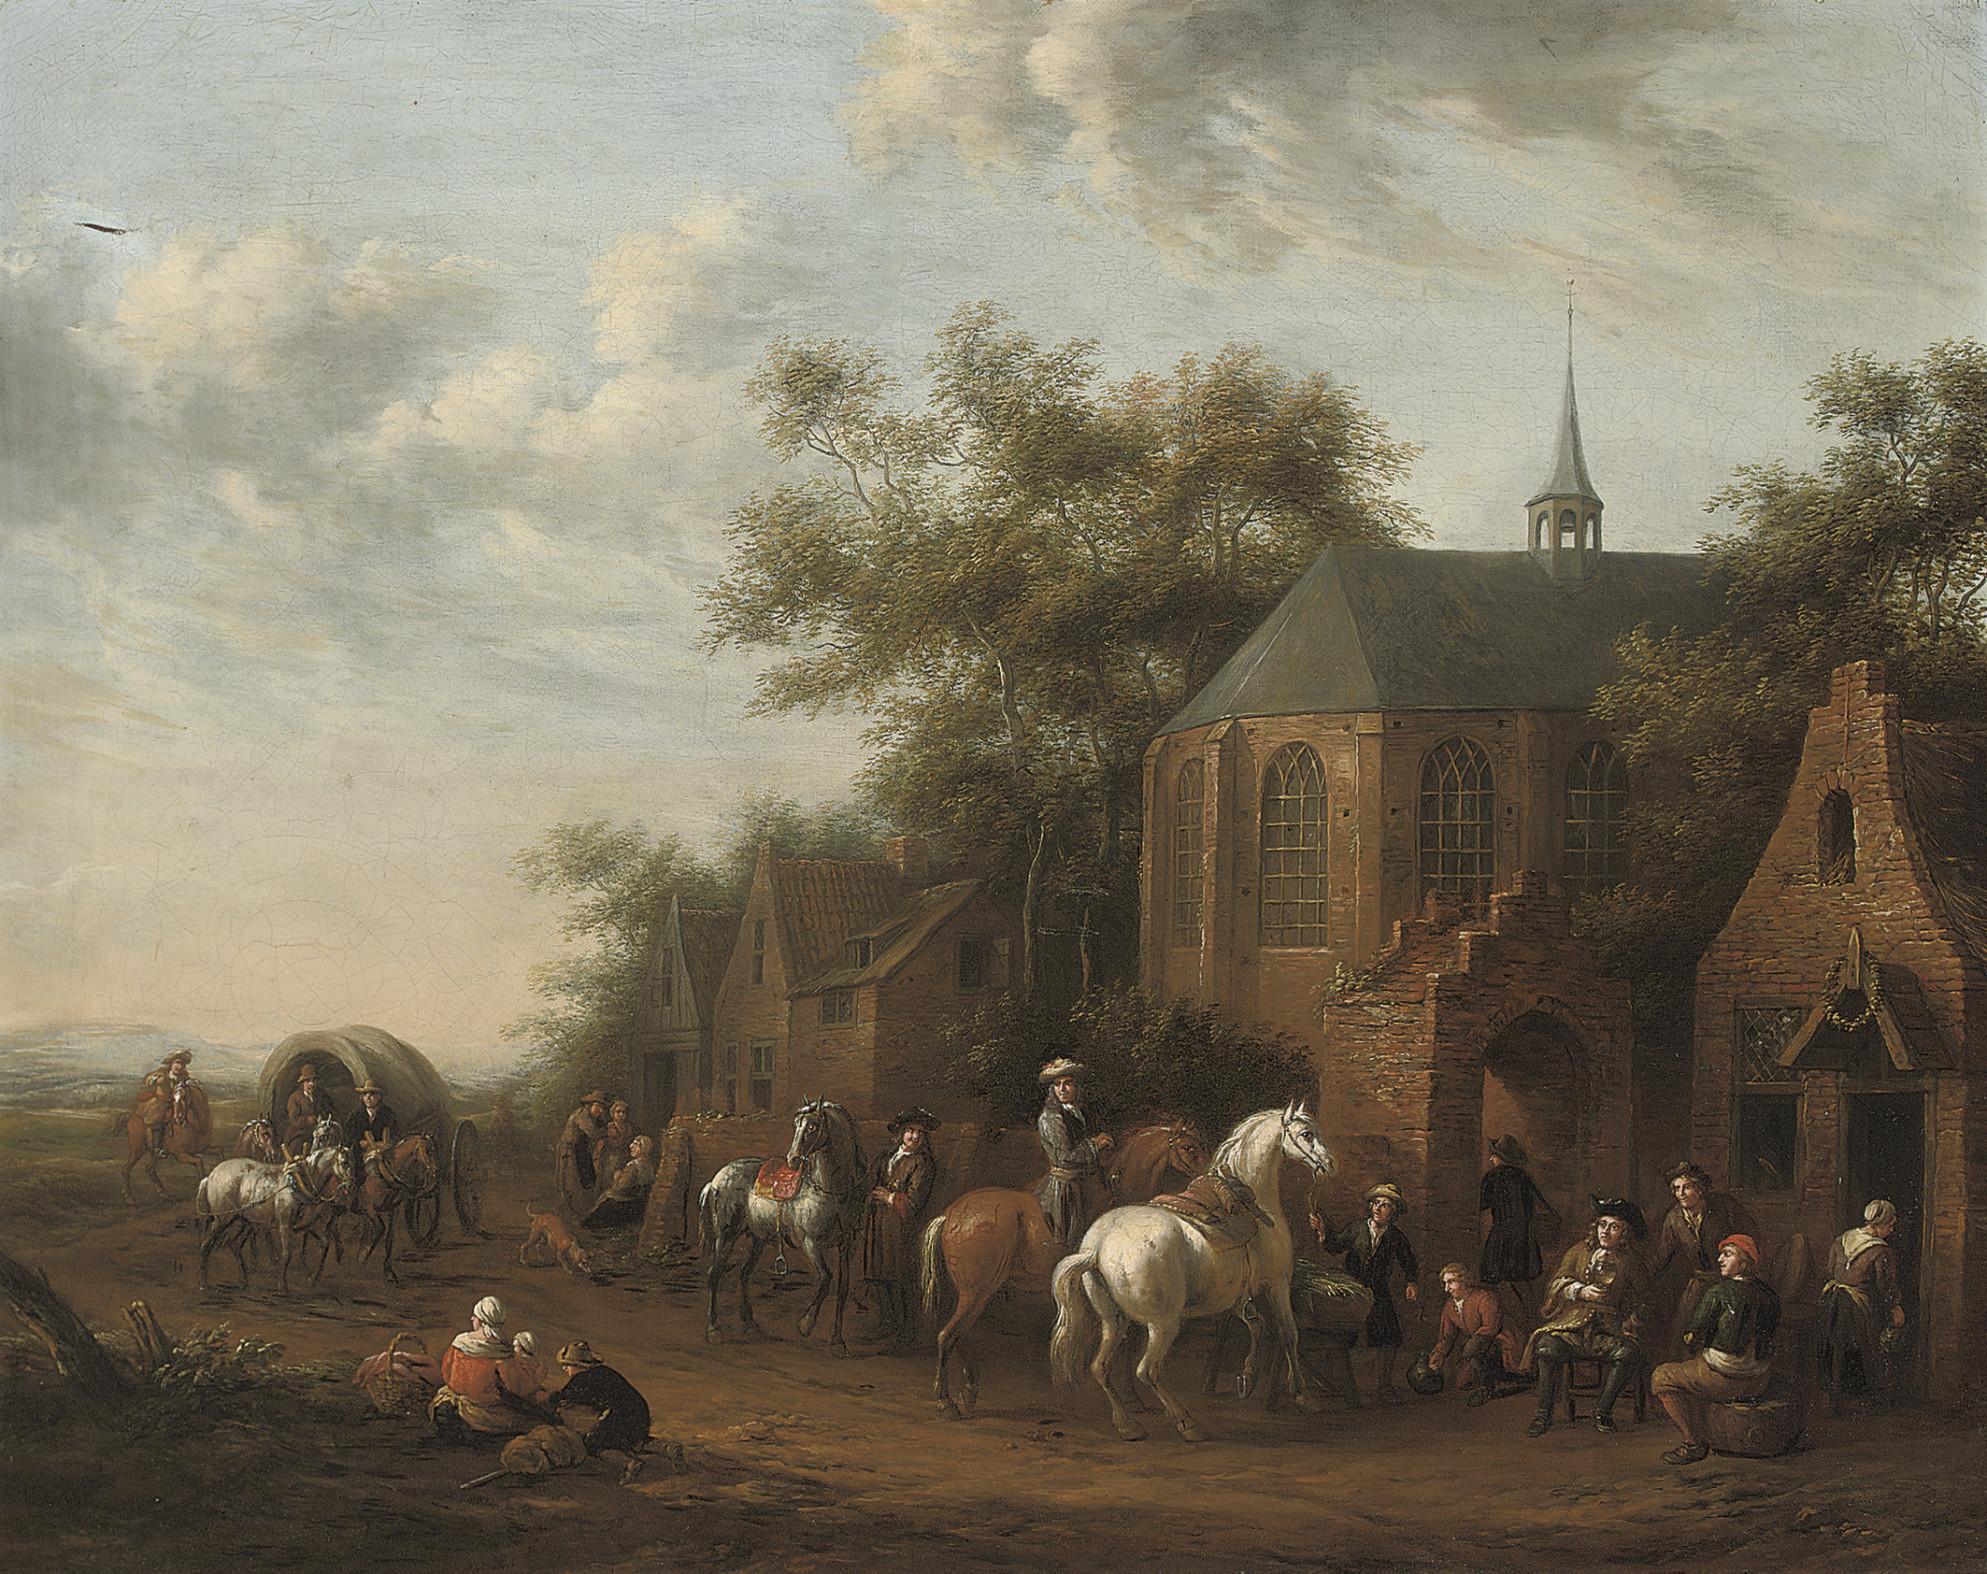 Figures on horseback at rest by an inn